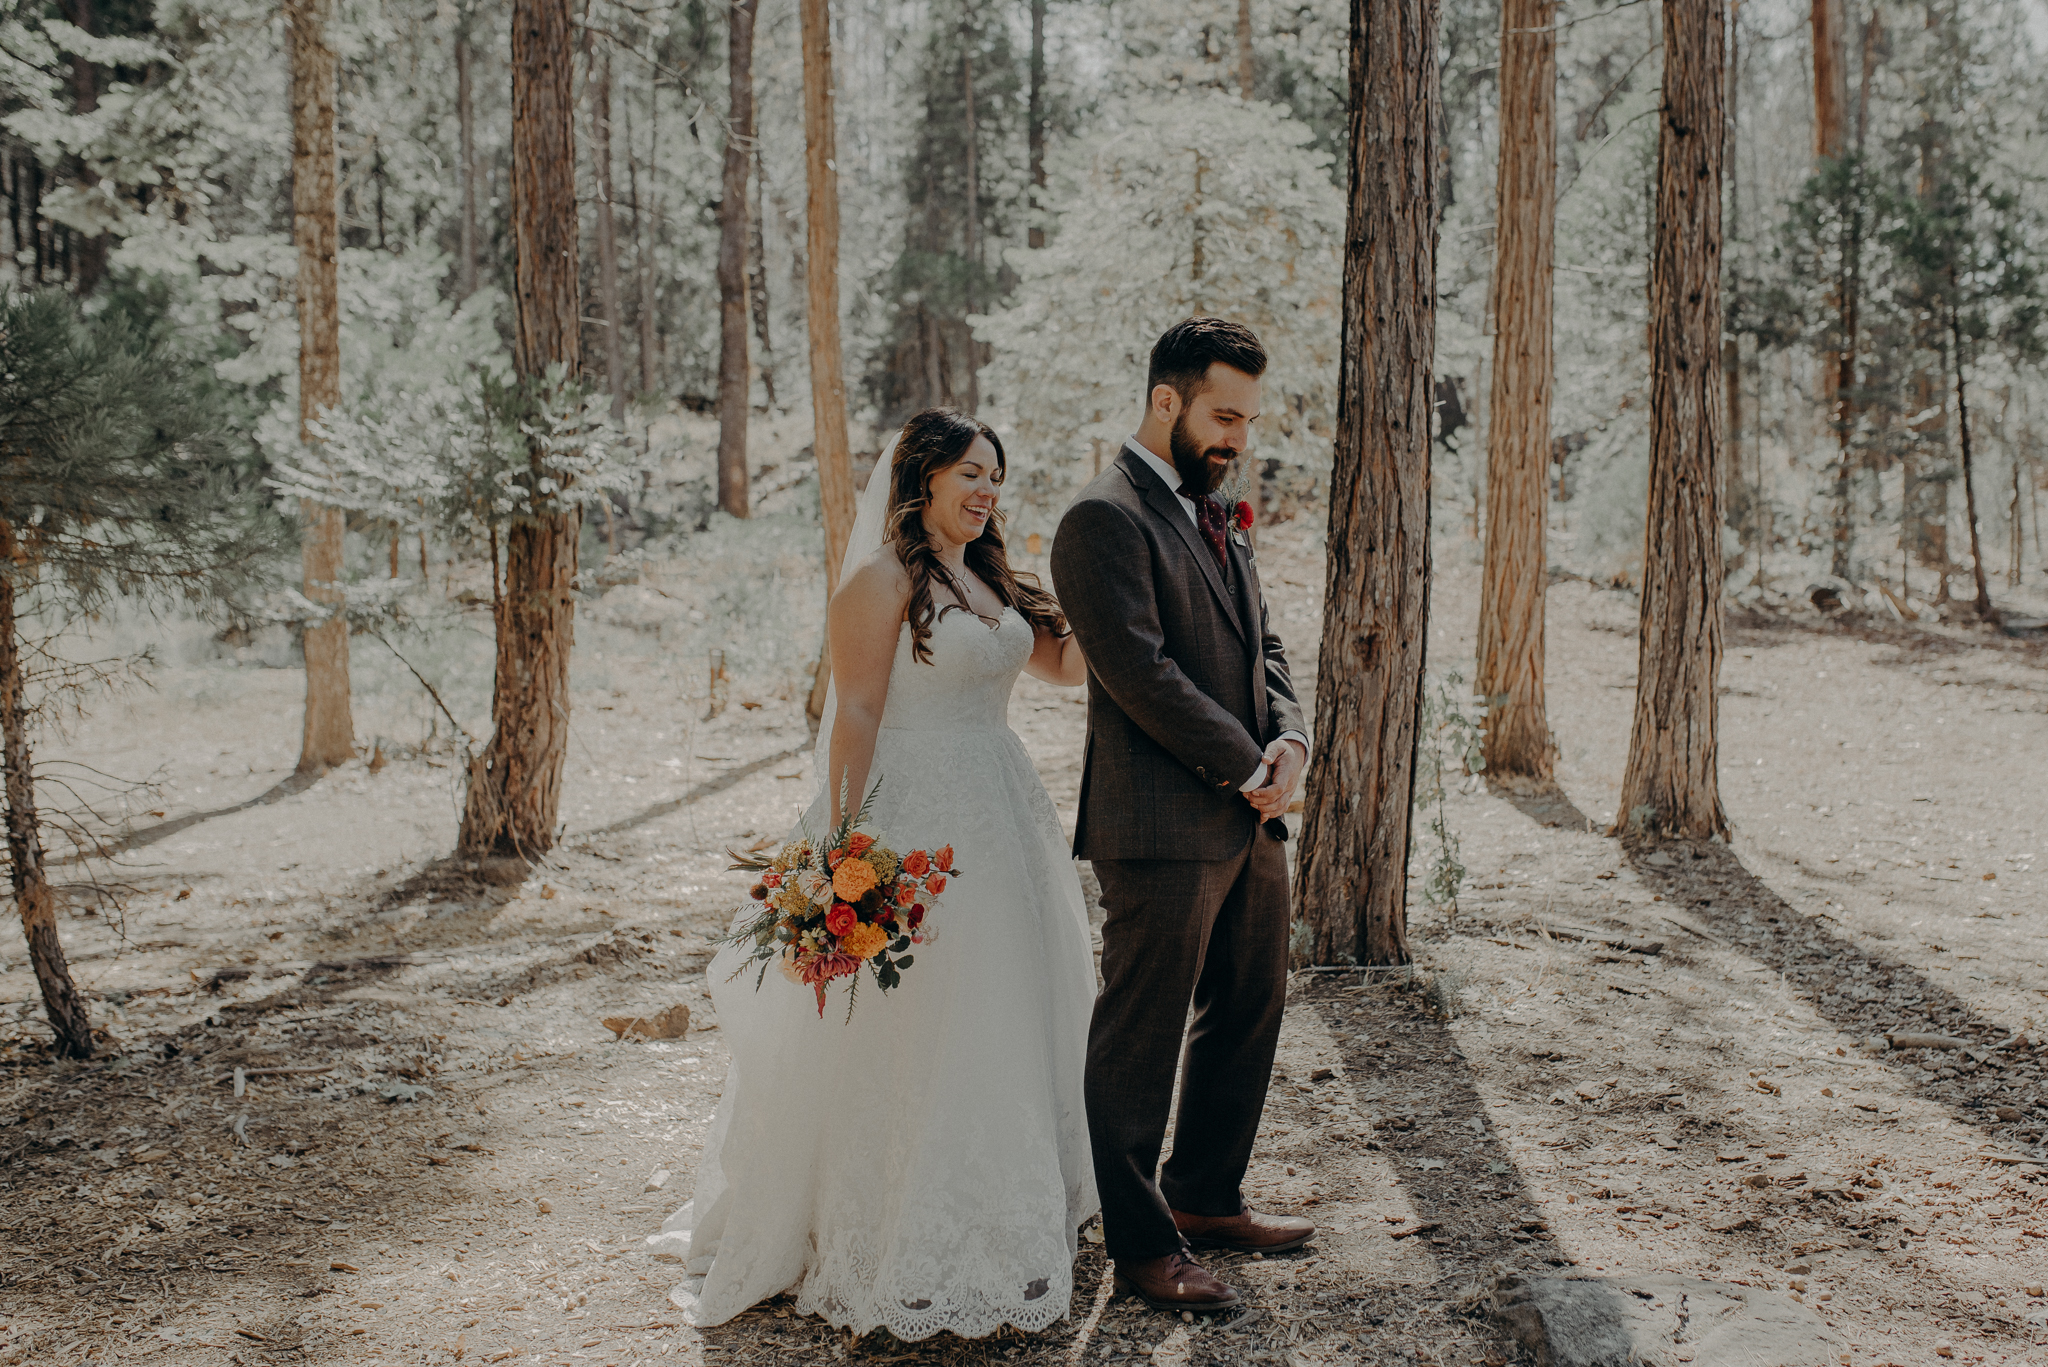 Yosemite Elopement Photographer - Evergreen Lodge Wedding Photographer - IsaiahAndTaylor.com-071.jpg